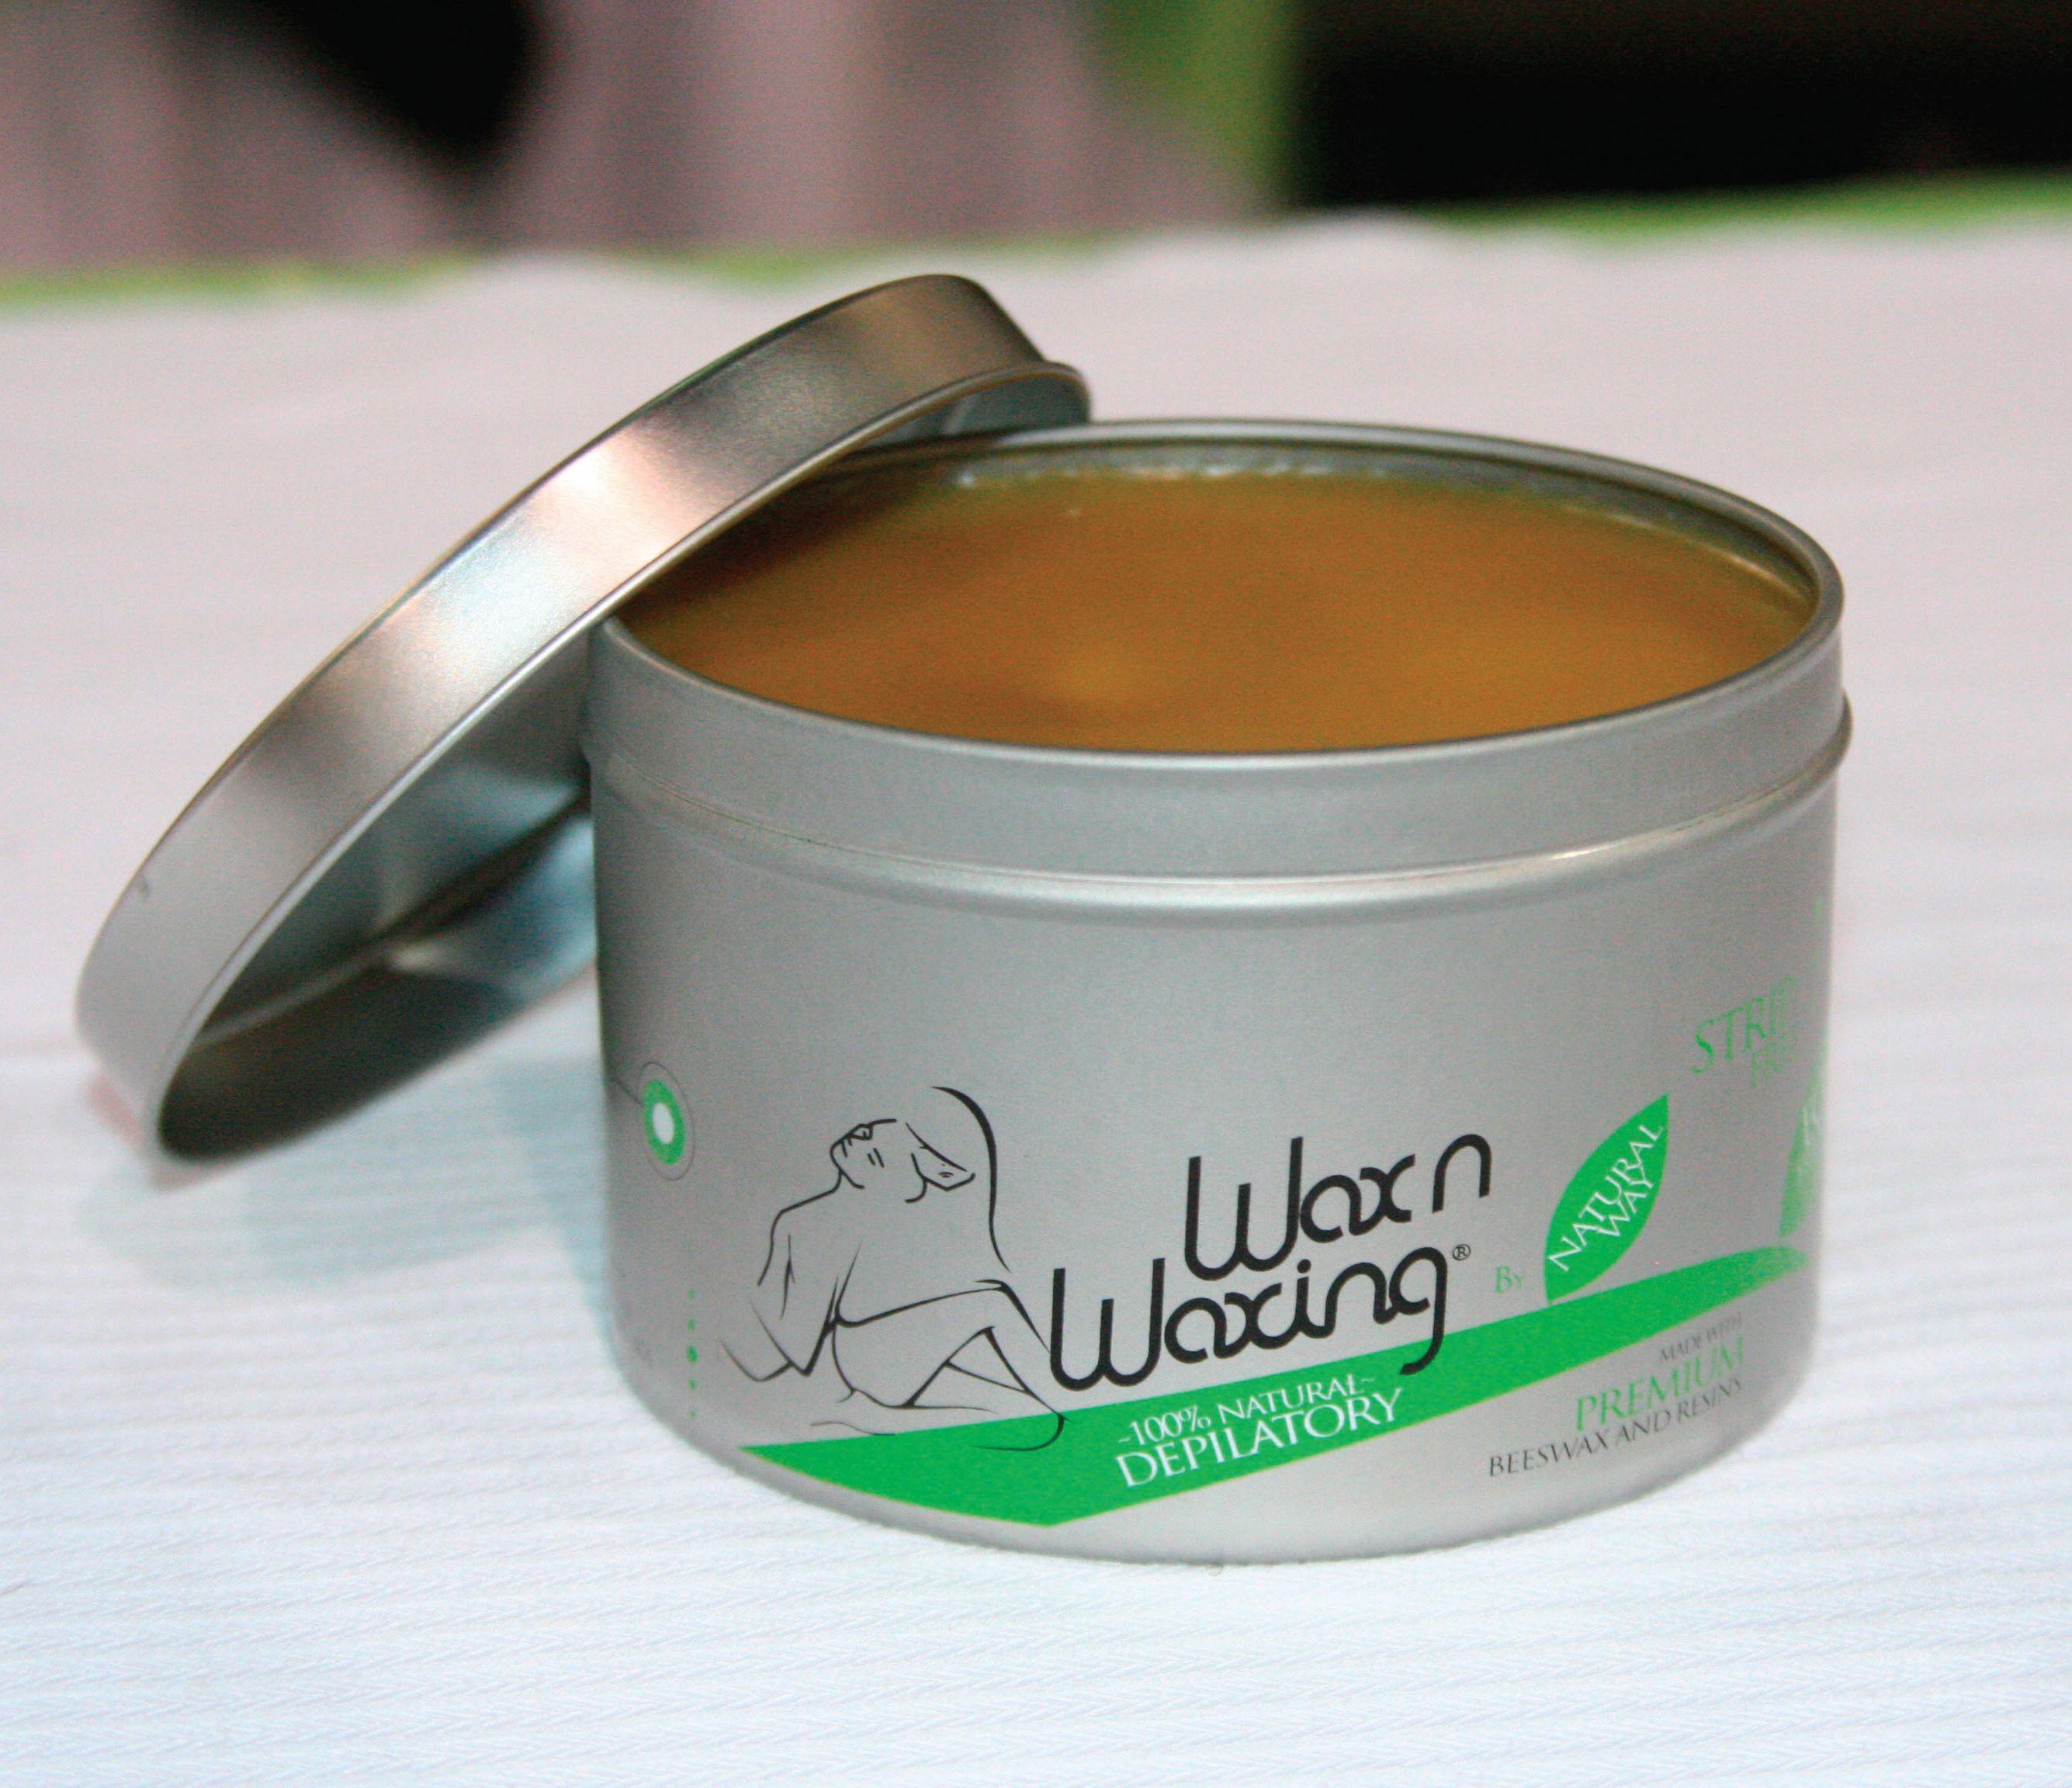 The Wonderful World of Wax